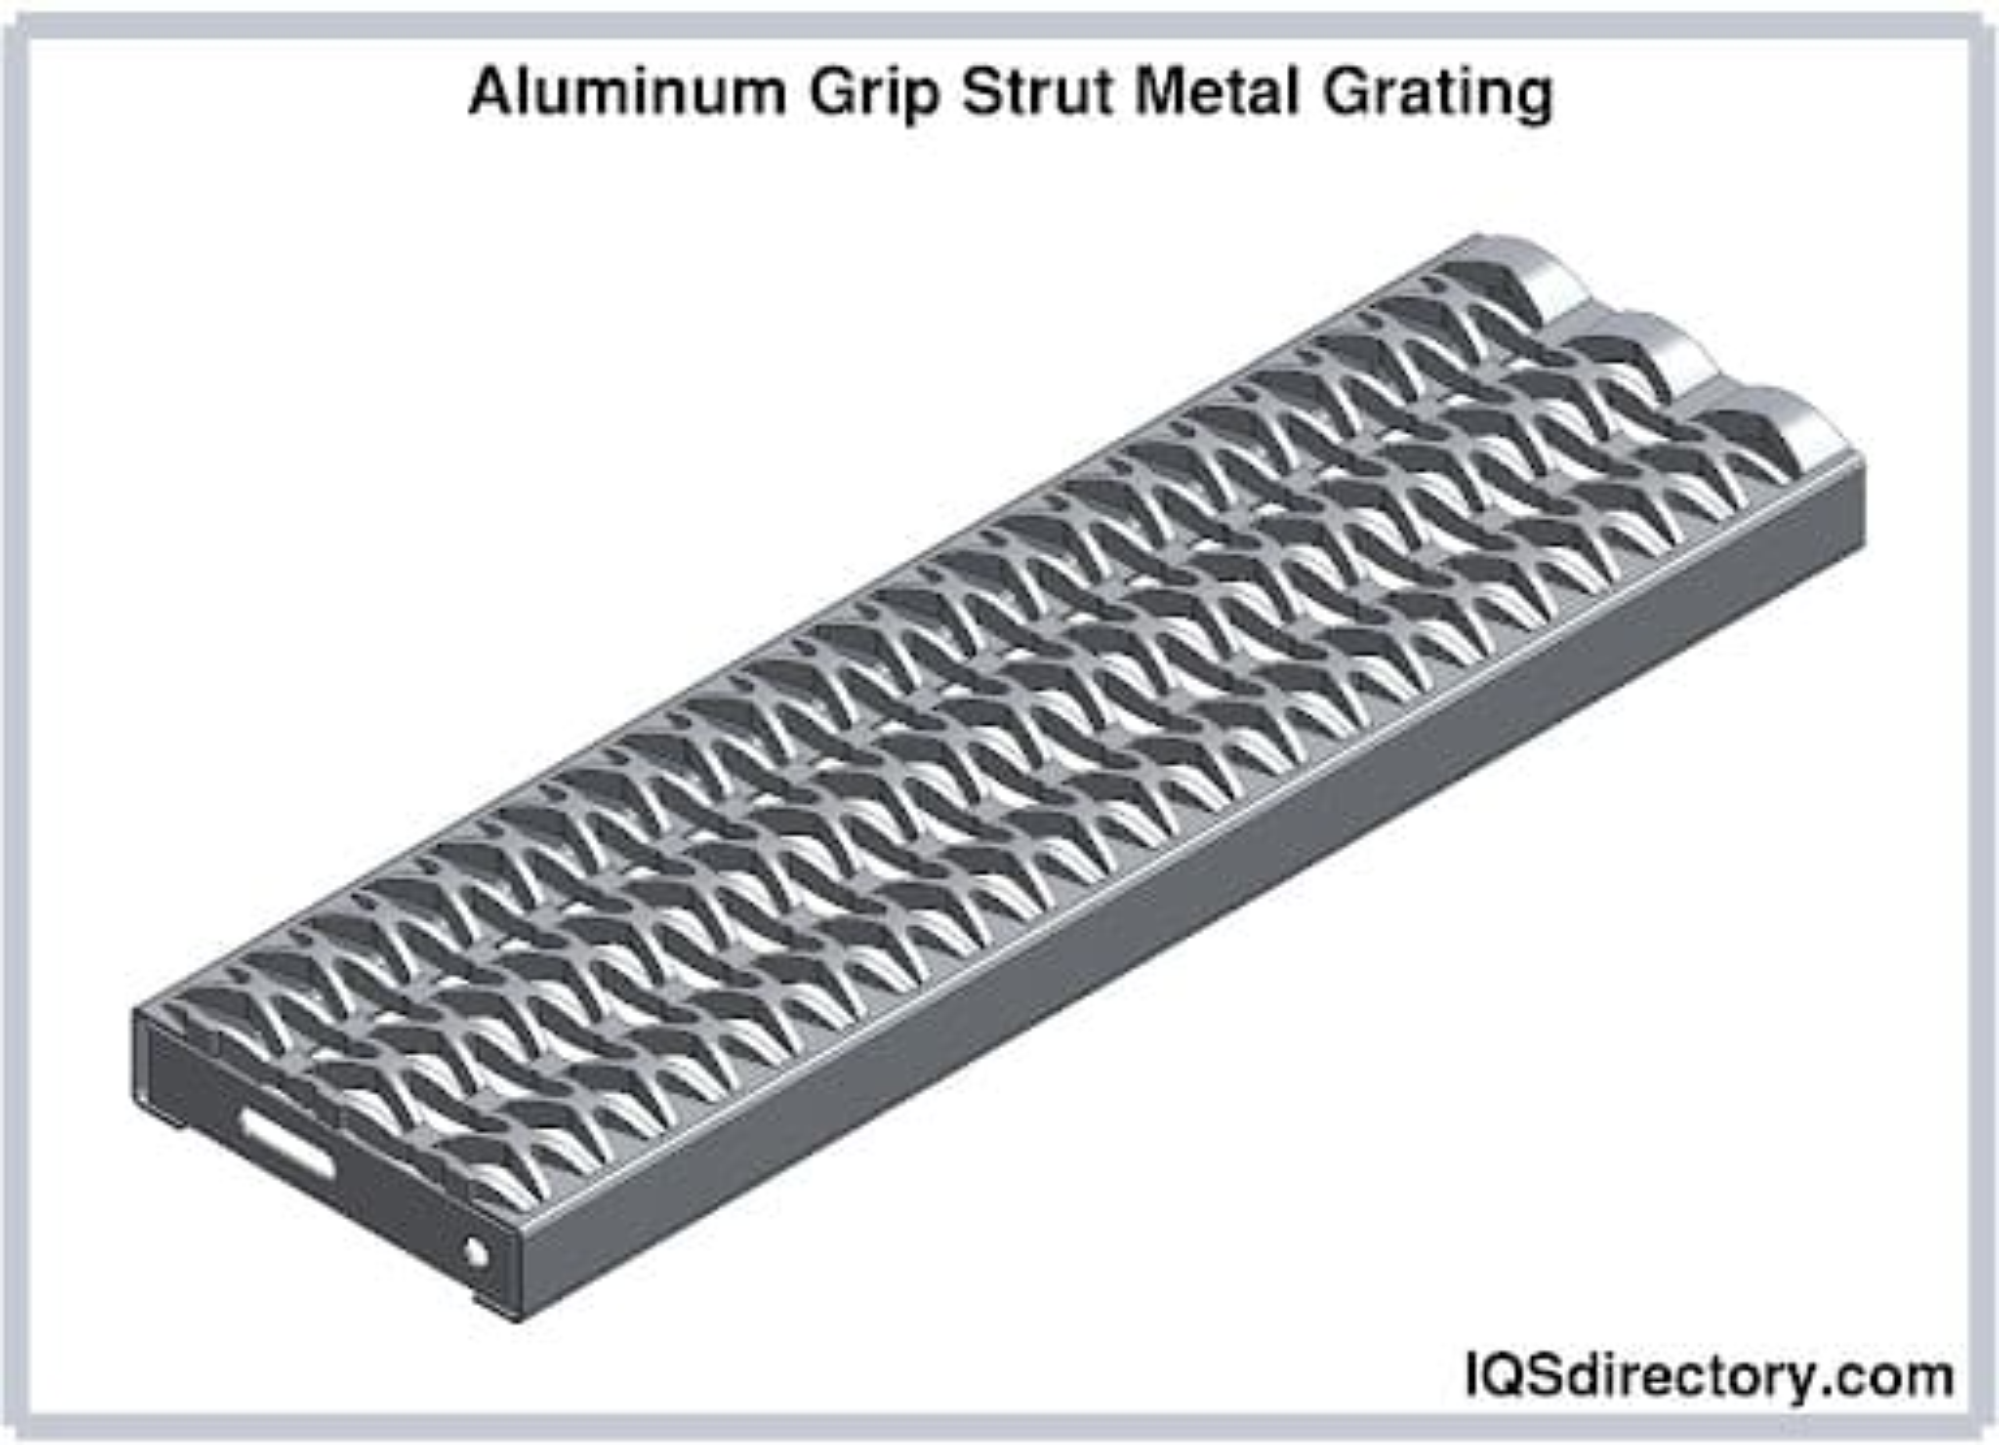 Aluminum Grip Strut Metal Grating